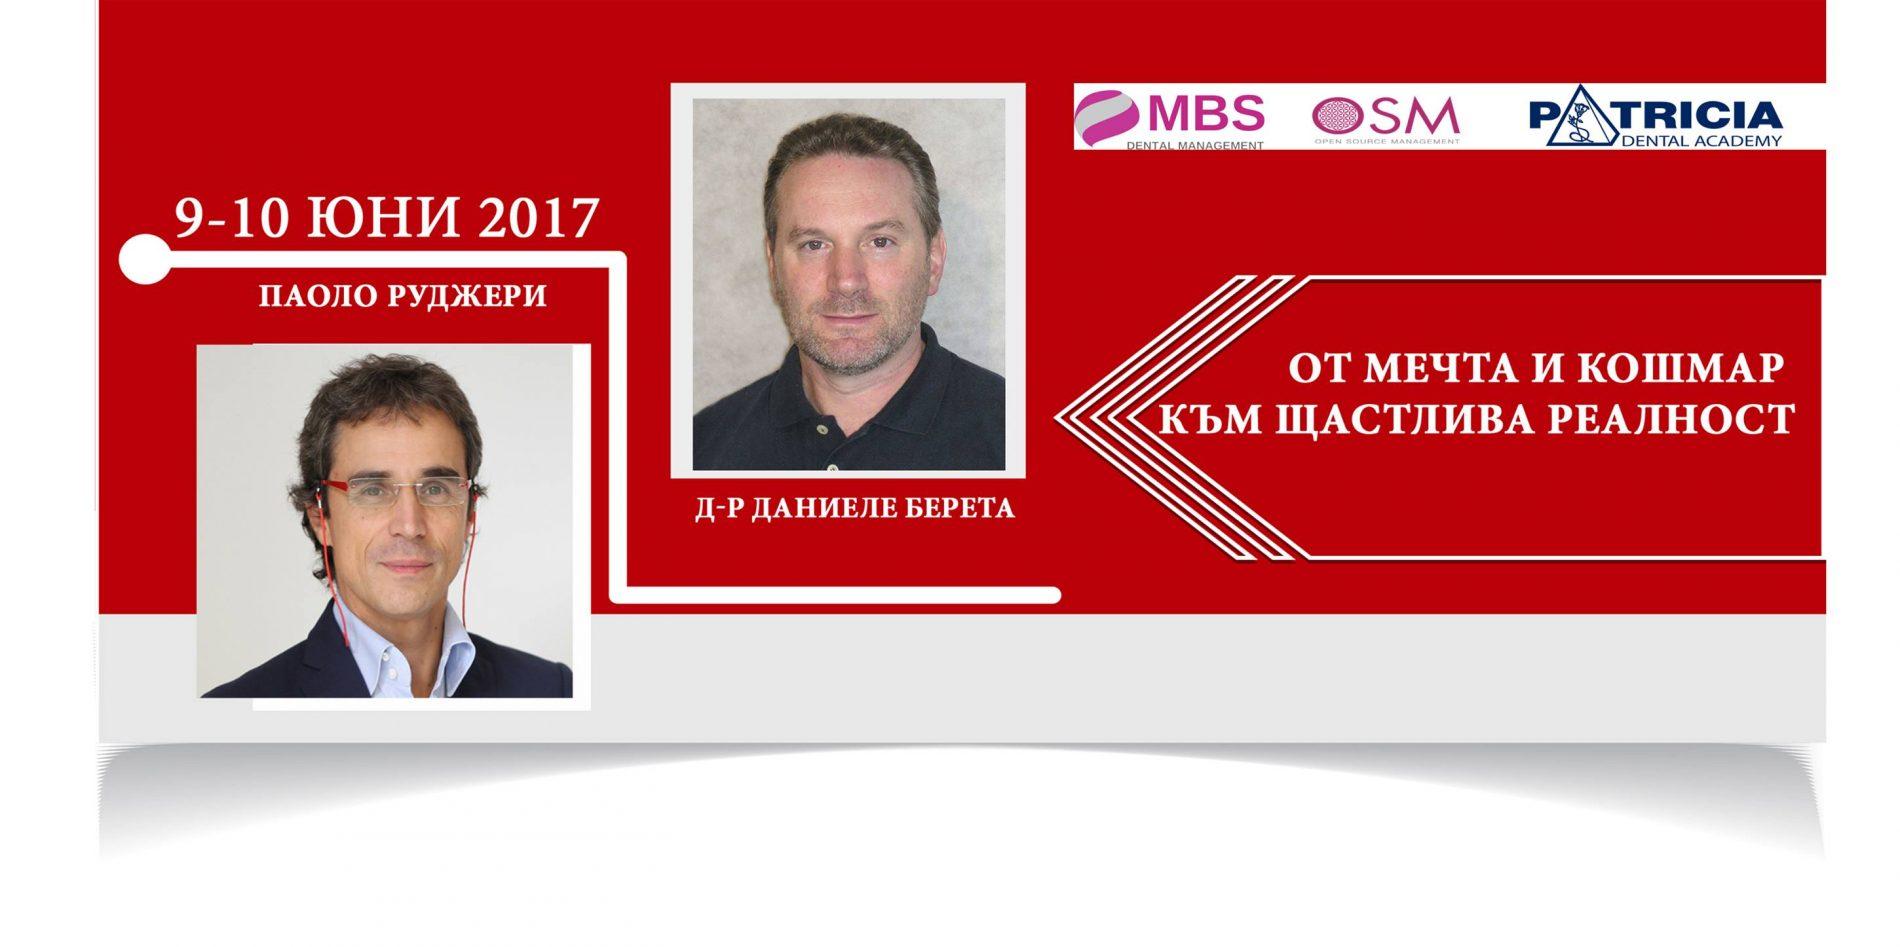 MBS Bulgaria 21-22 Октомври